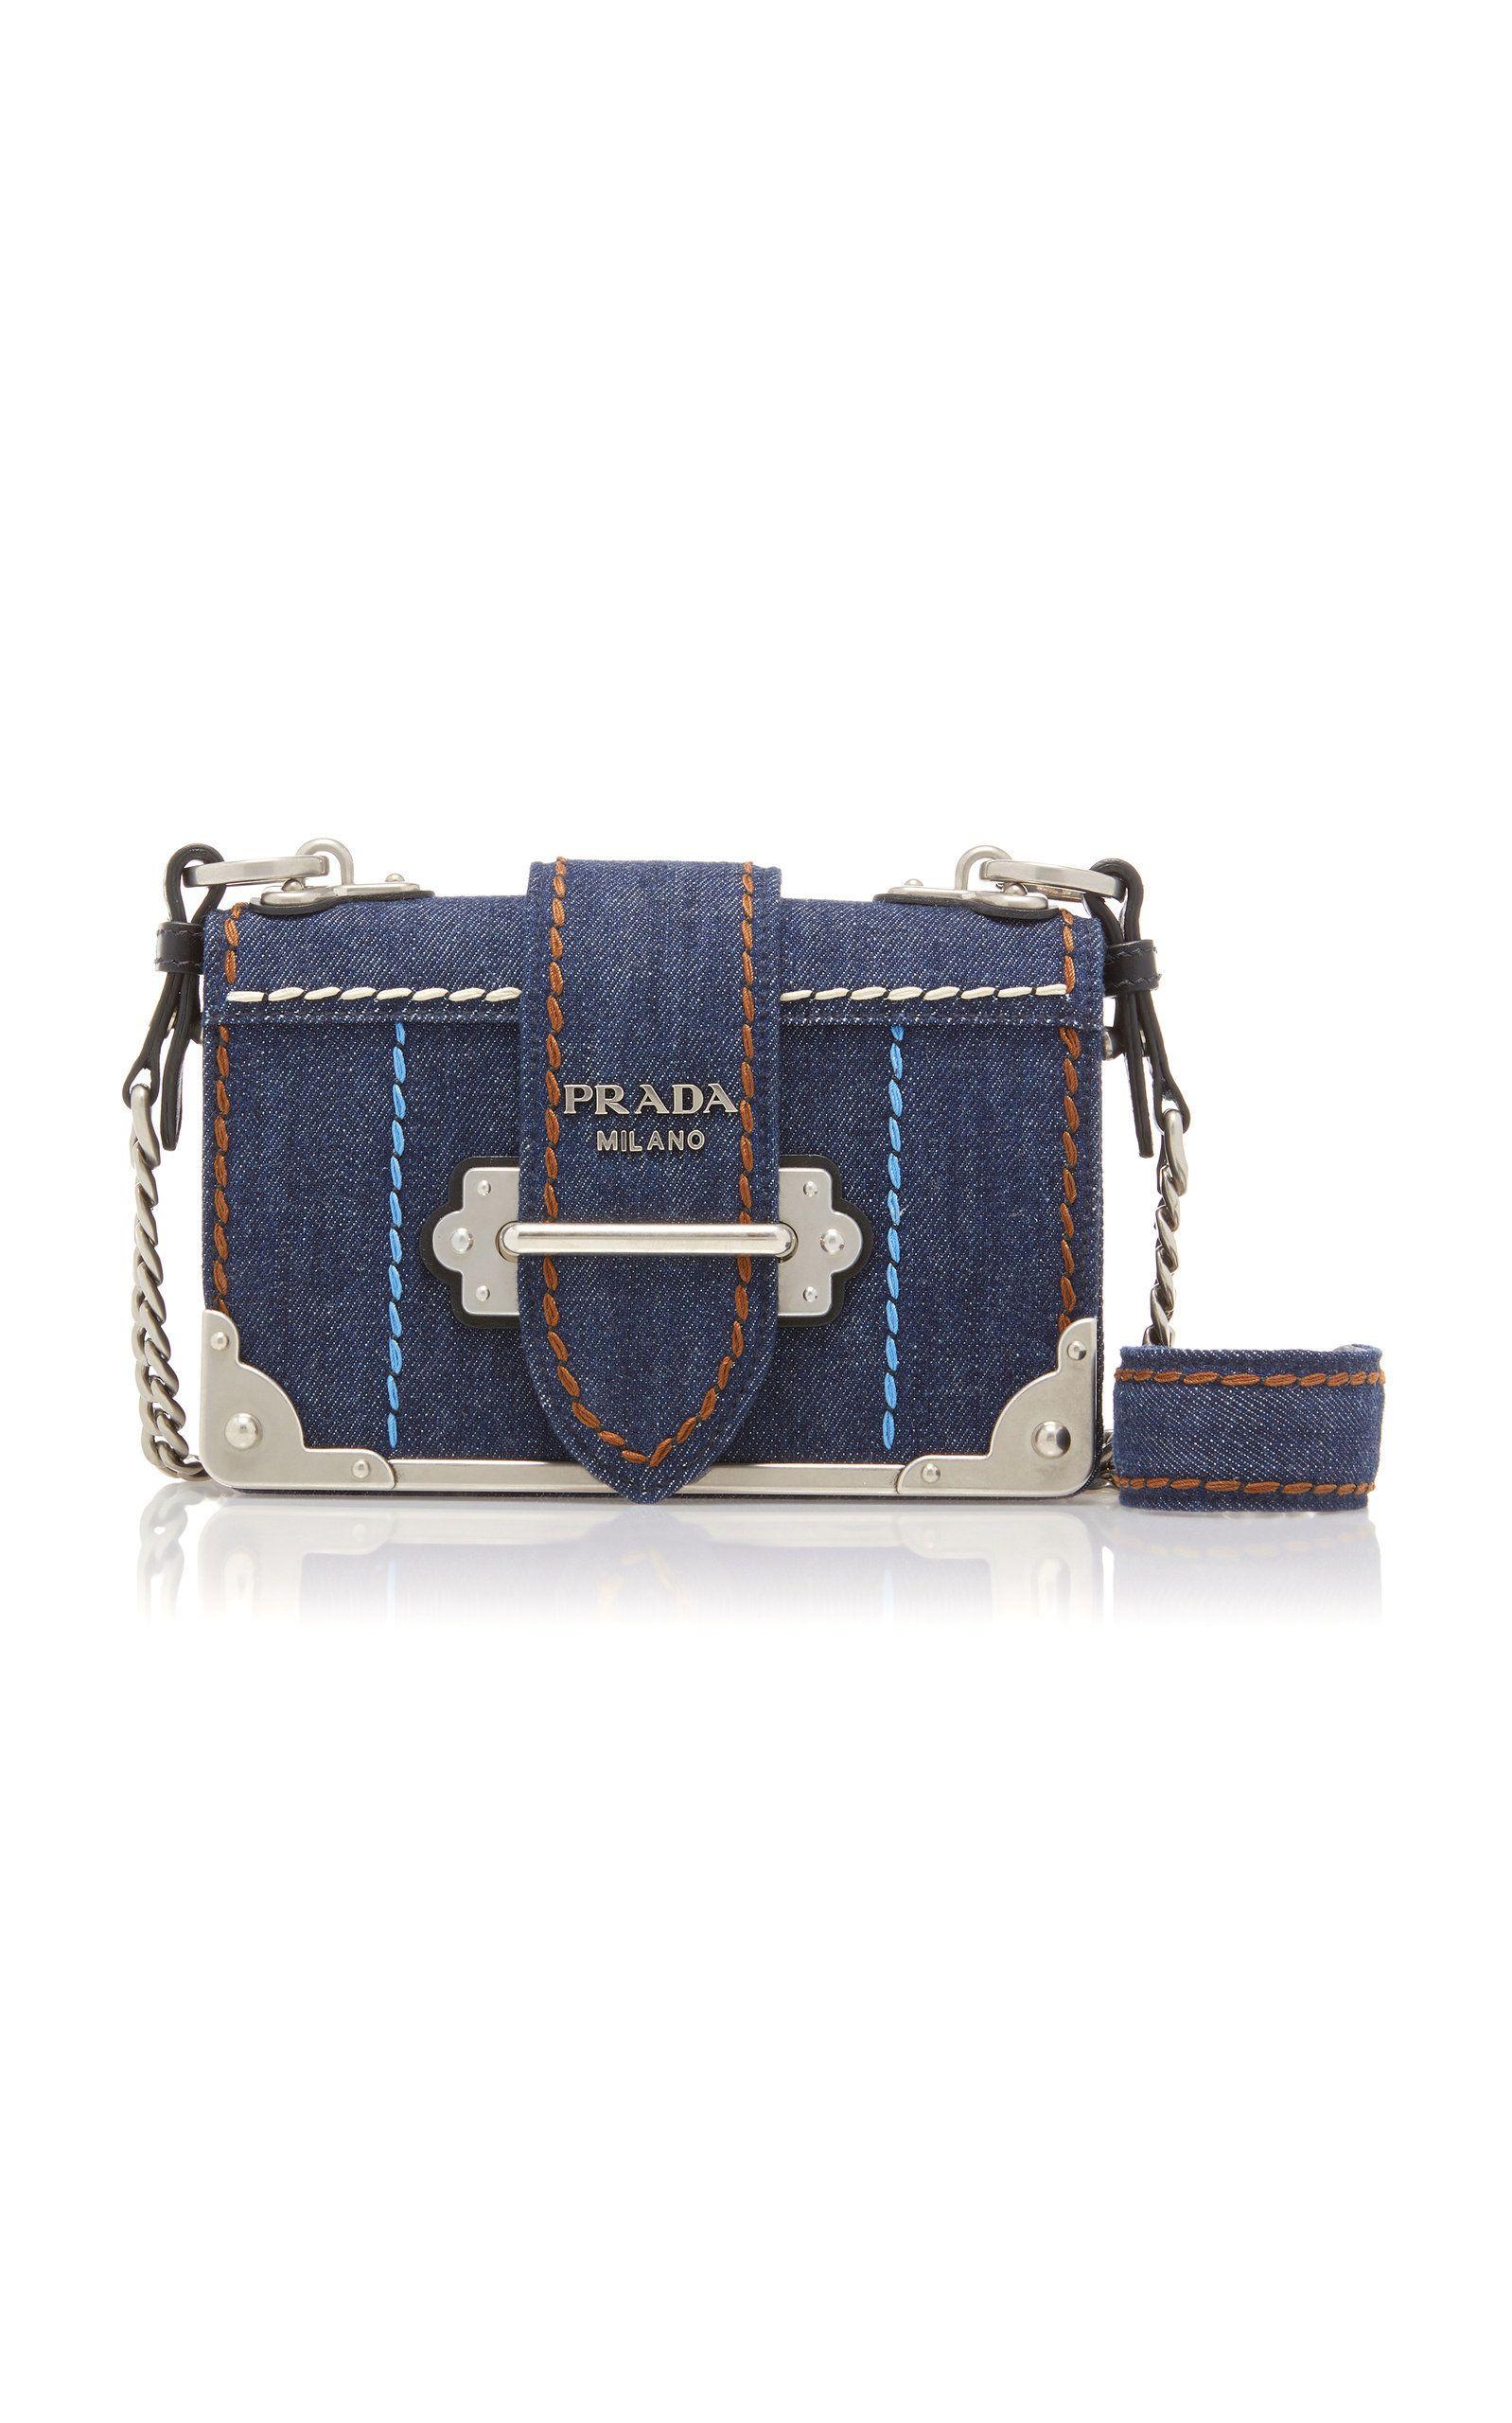 1a3b3198e28a Cahier Leather-Trimmed Denim Shoulder Bag in 2019